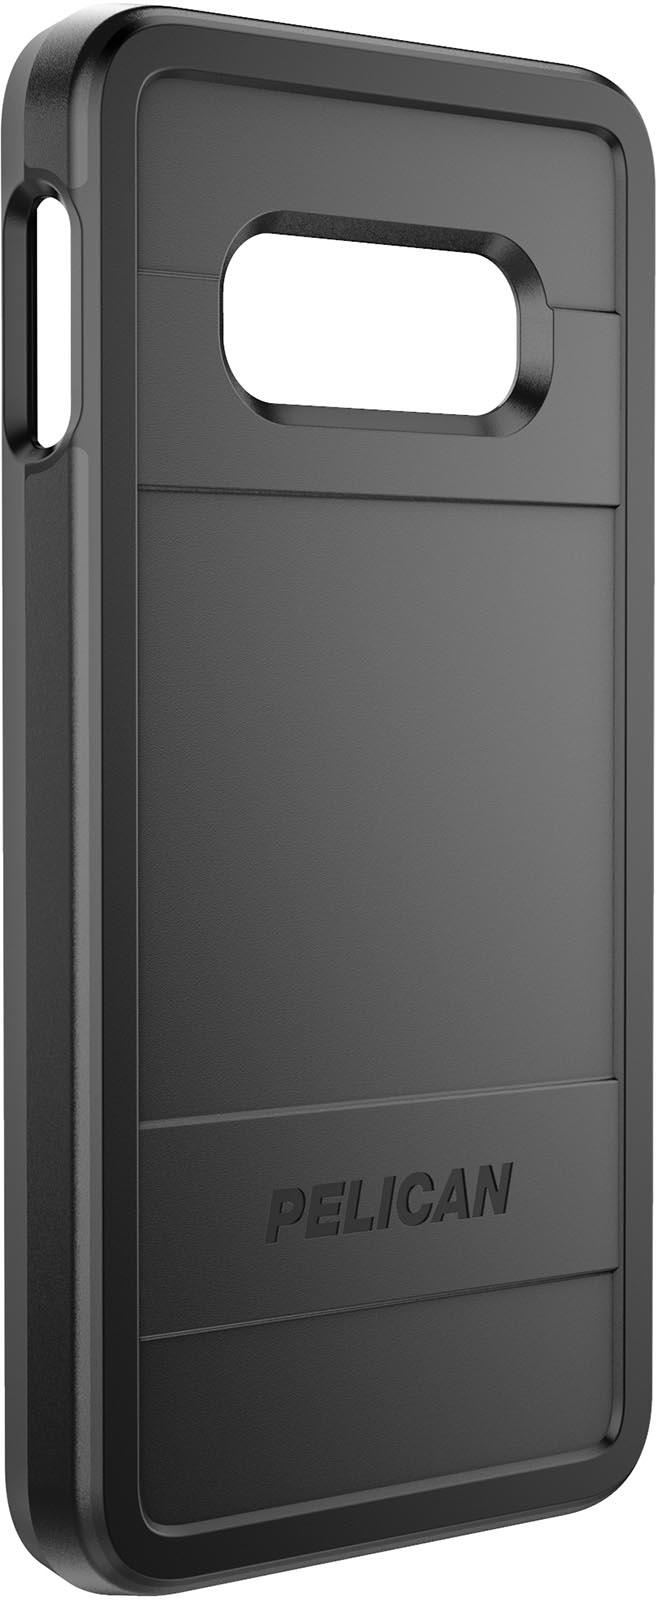 pelican c48000 samsung galaxy s10e black phone case